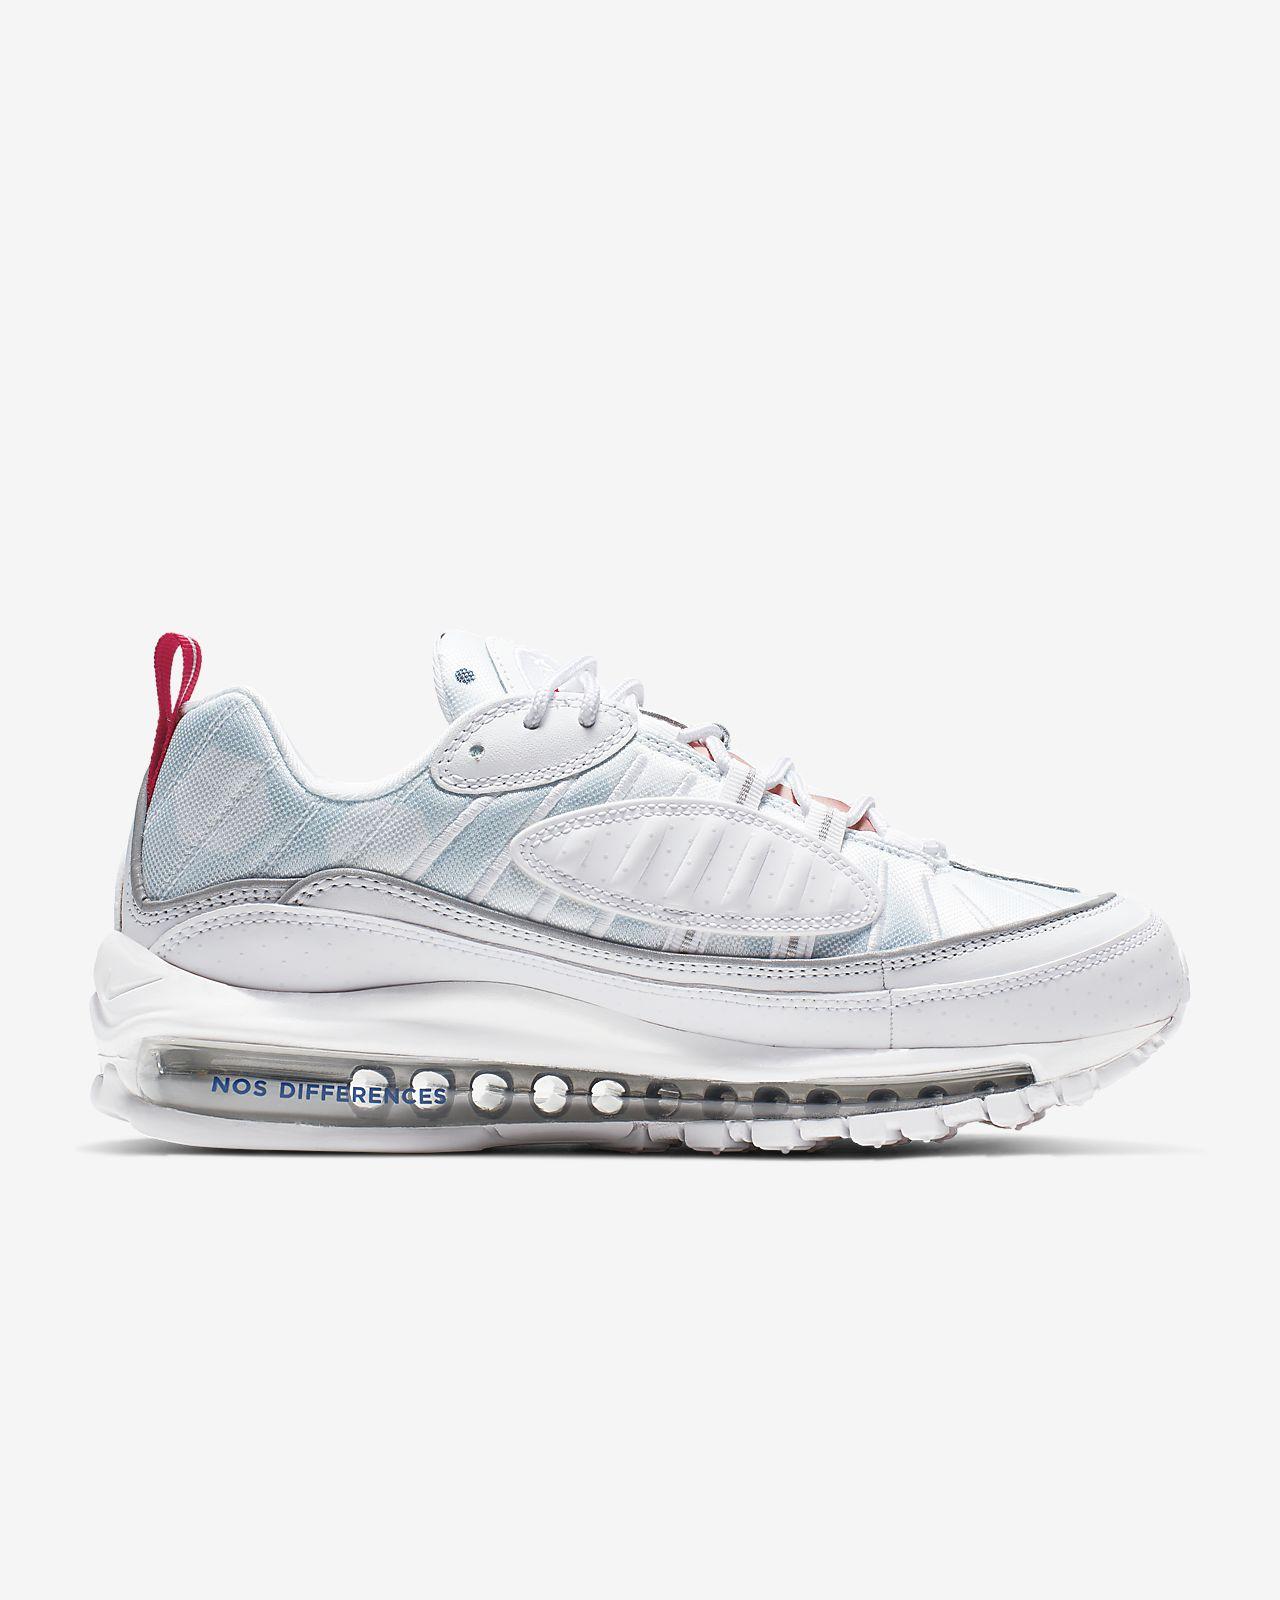 9bf0425e81 Nike Air Max 98 Premium Unité Totale Women's Shoe. Nike.com GB